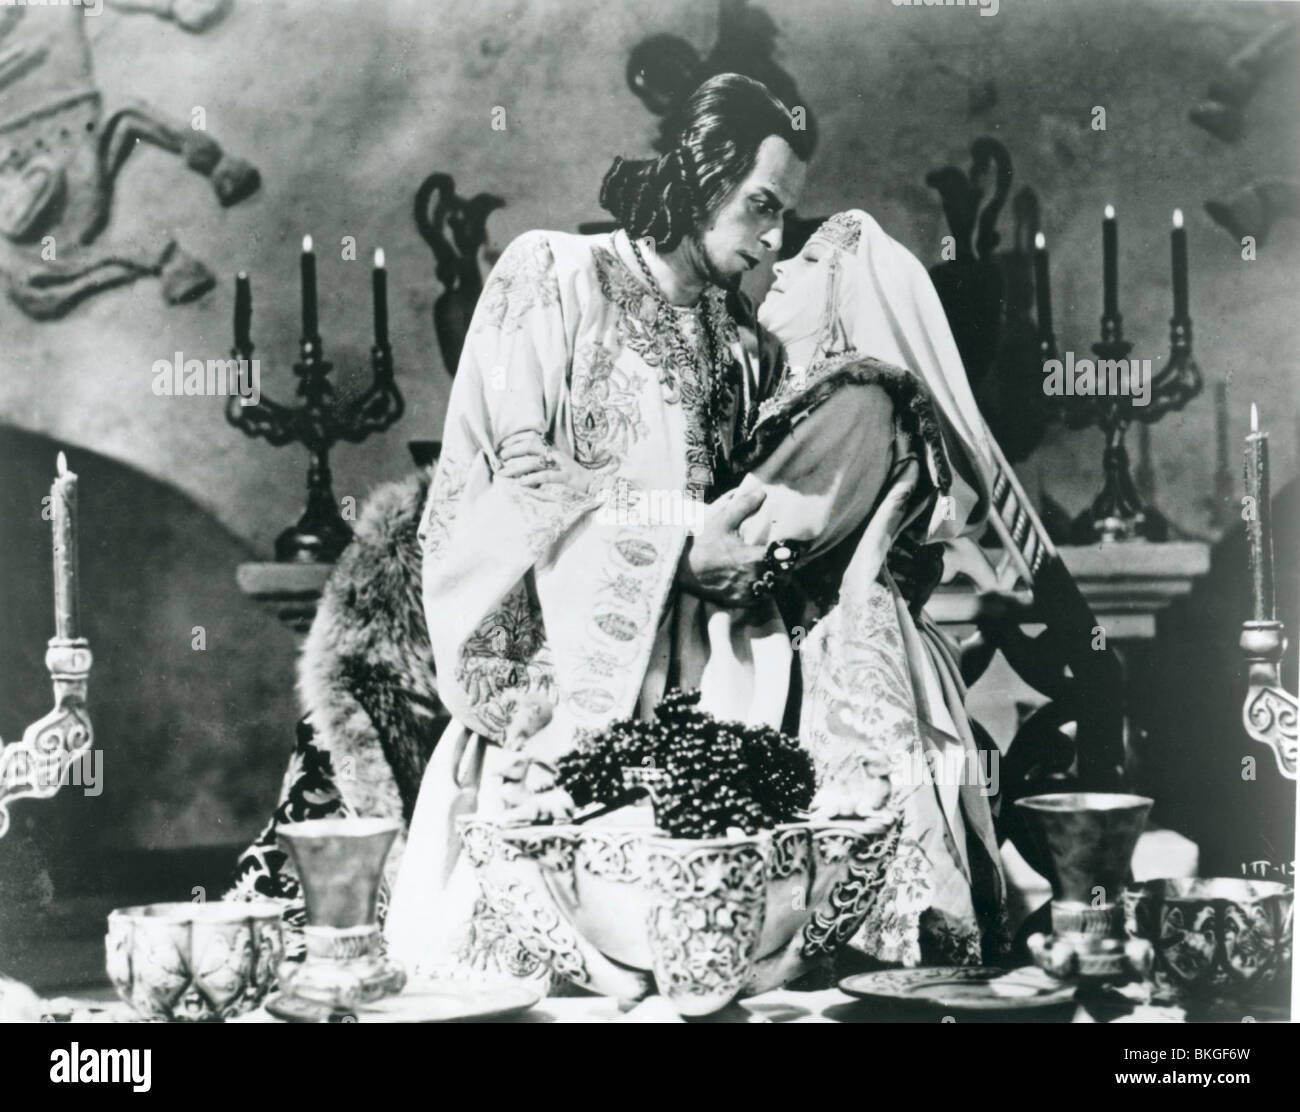 IVAN GROZNI (1942) IVAN THE TERRIBLE (ALT) NIKOLAI CHERKASOV, LYUDMILA TSELIKOVSKAYA IVTB 001P - Stock Image